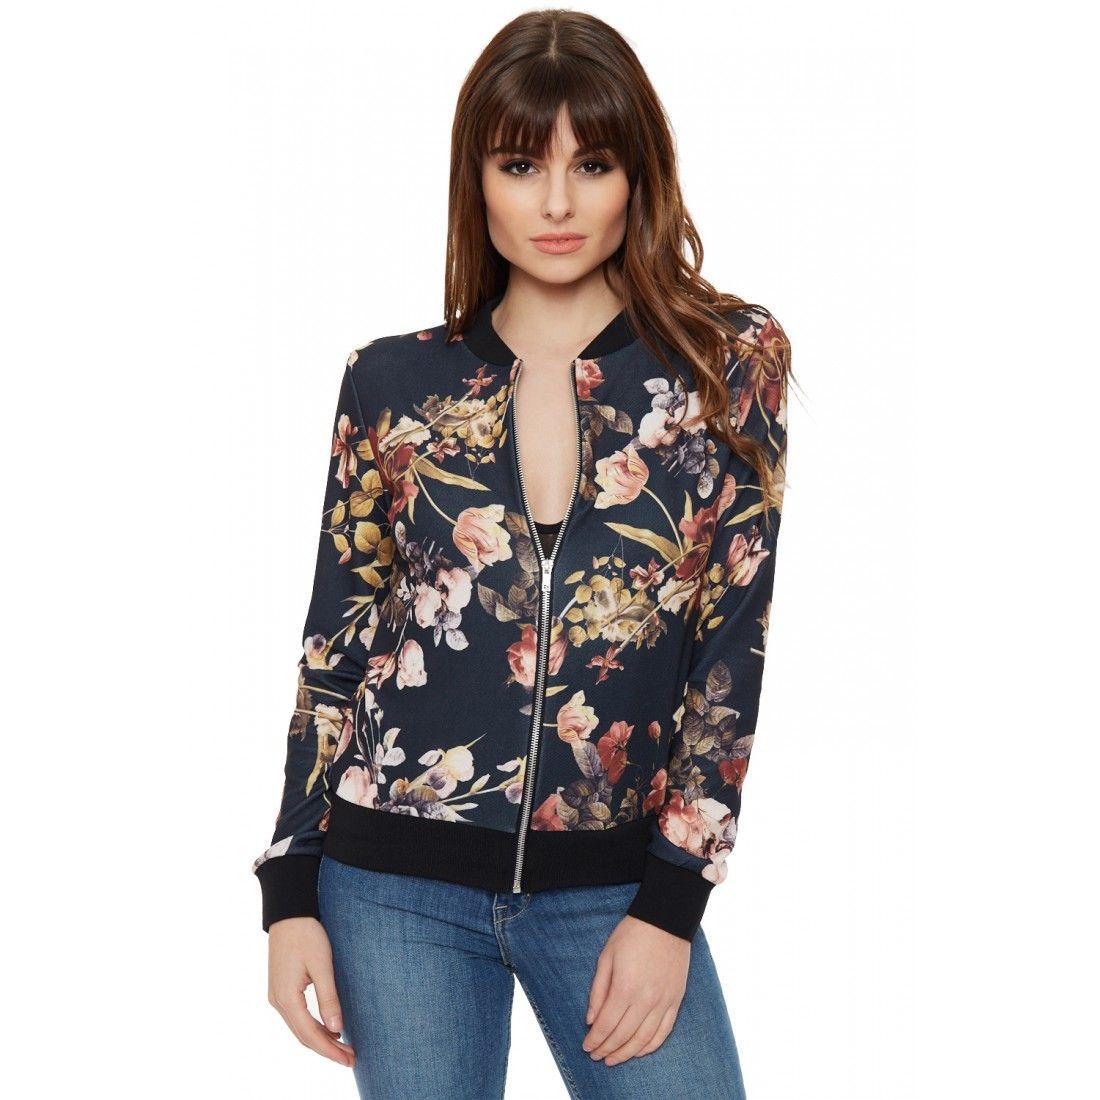 Xenia Floral Bomber Jacket | Floral Bomber--碎花轰炸机 | Pinterest ...